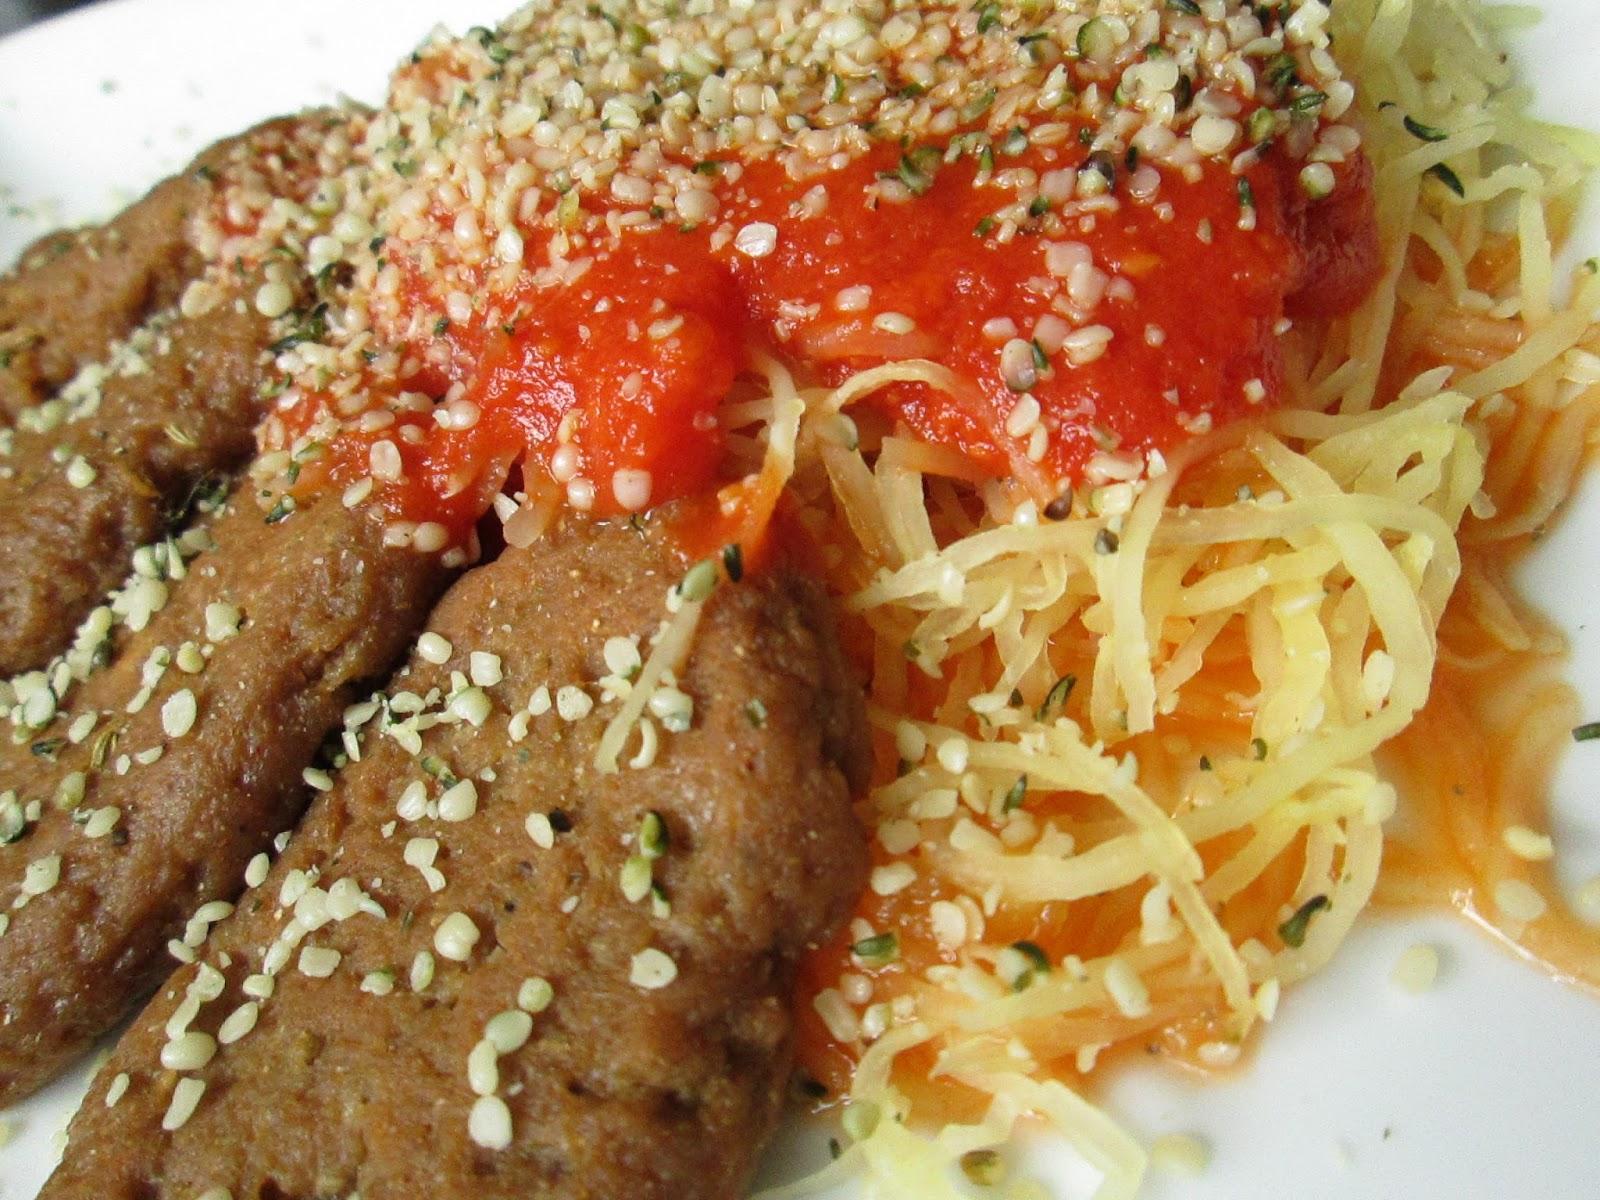 Don't Get Mad, Get Vegan!: Roasted Spaghetti Squash Dinner